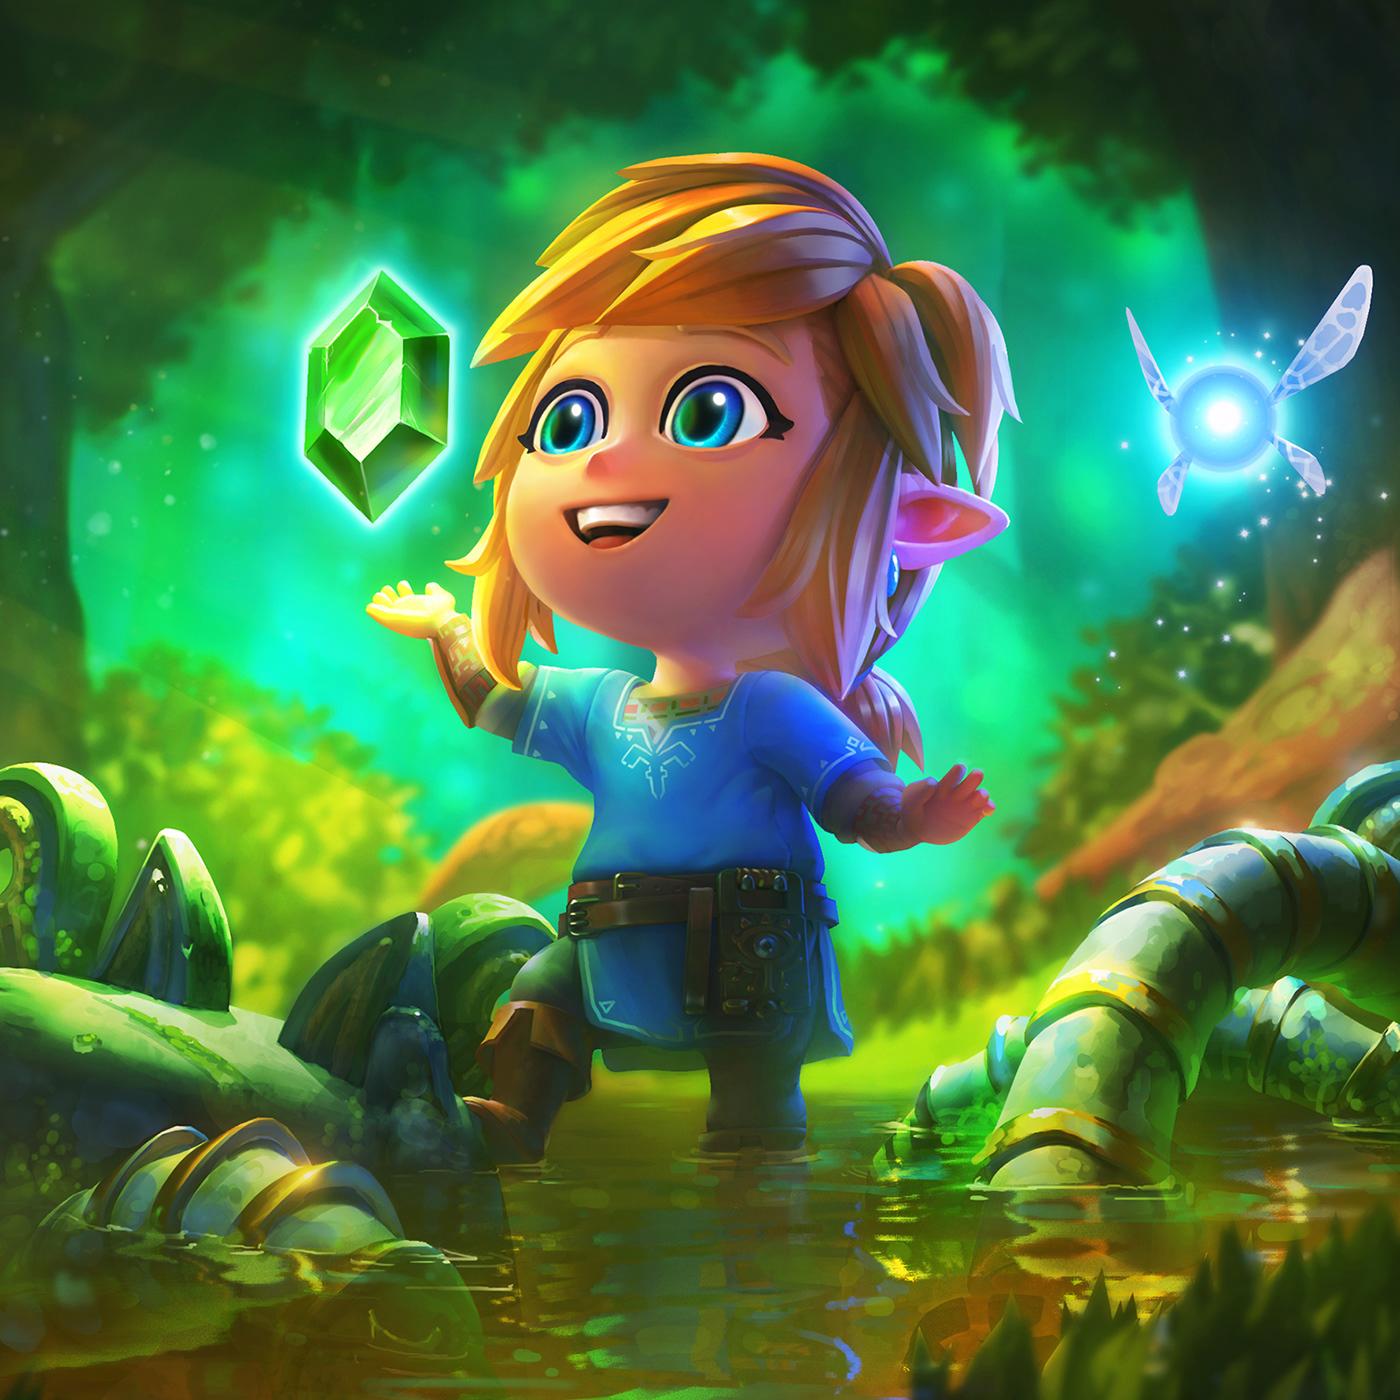 2D 3D cute fanart fantasy gameart ILLUSTRATION  link Nintendo zelda